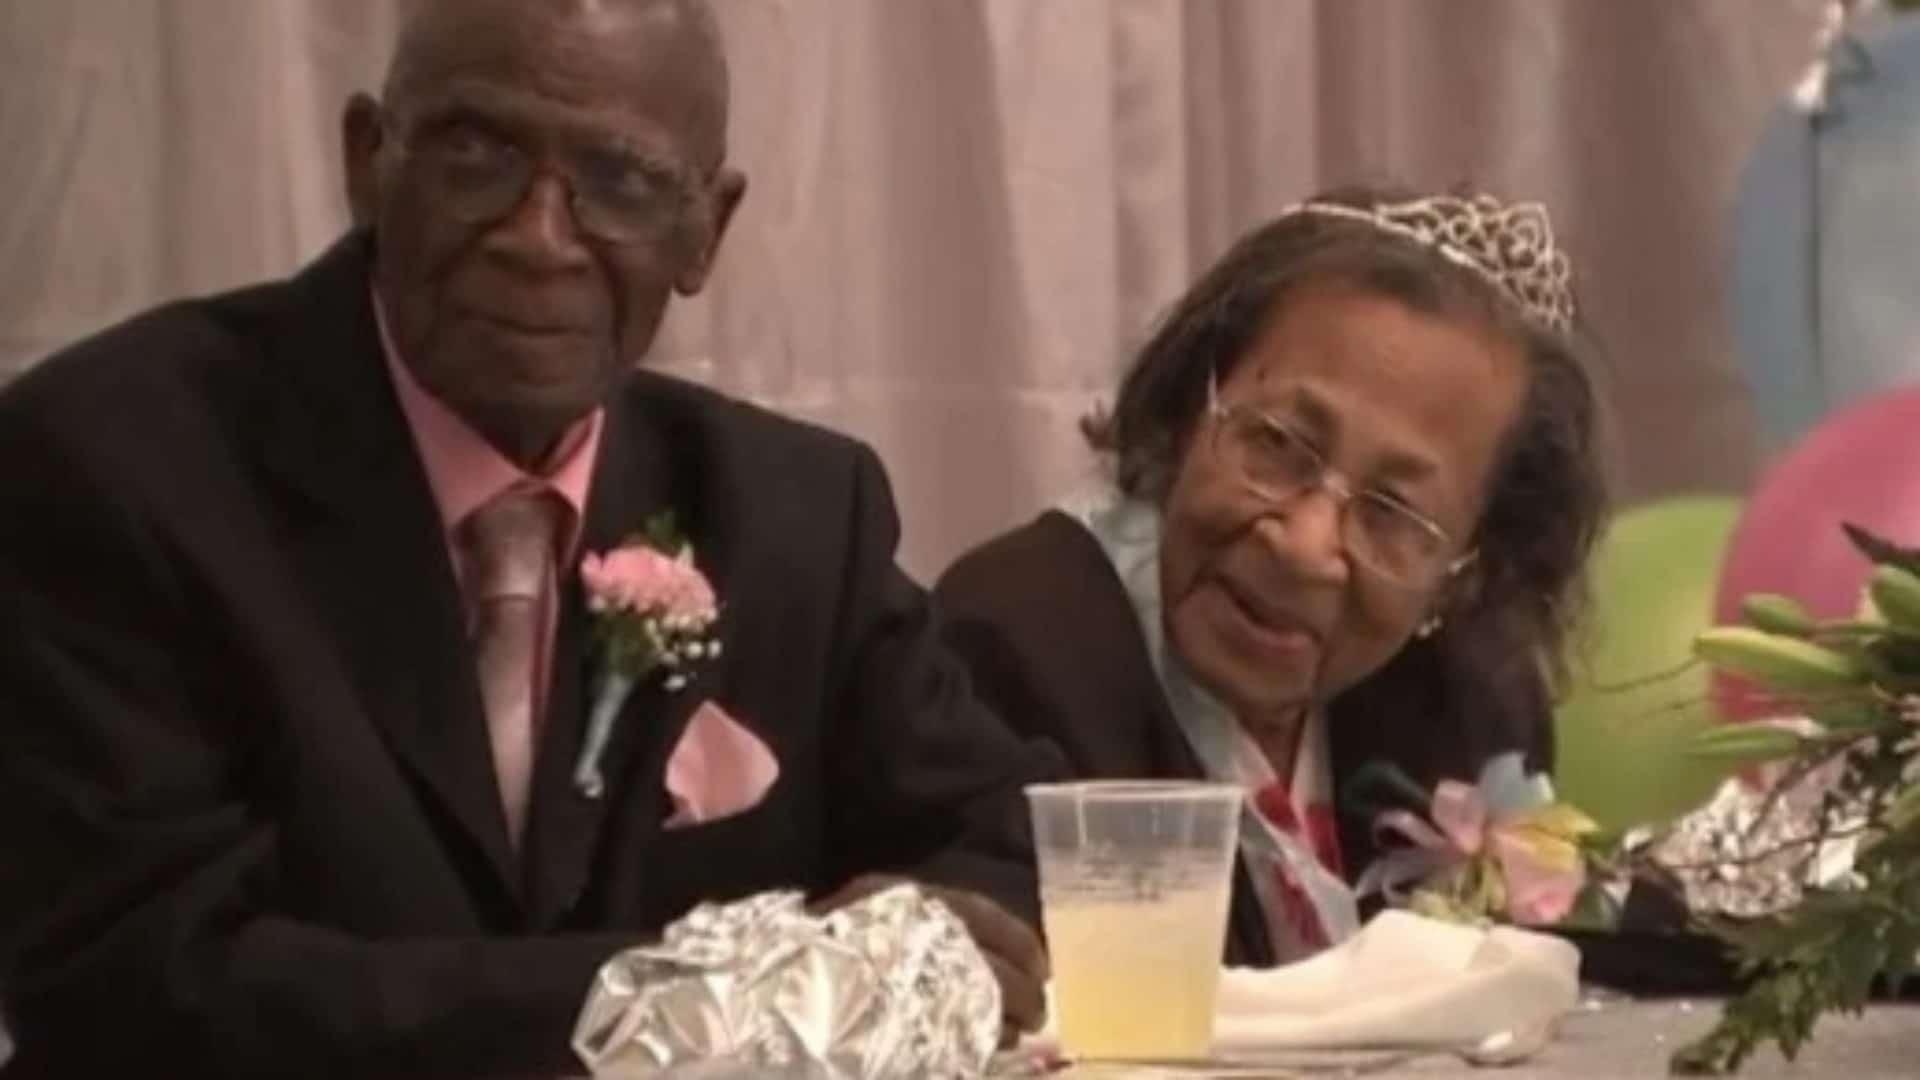 Centenarian Couple Celebrating 82nd Wedding Anniversary Share Their Secret